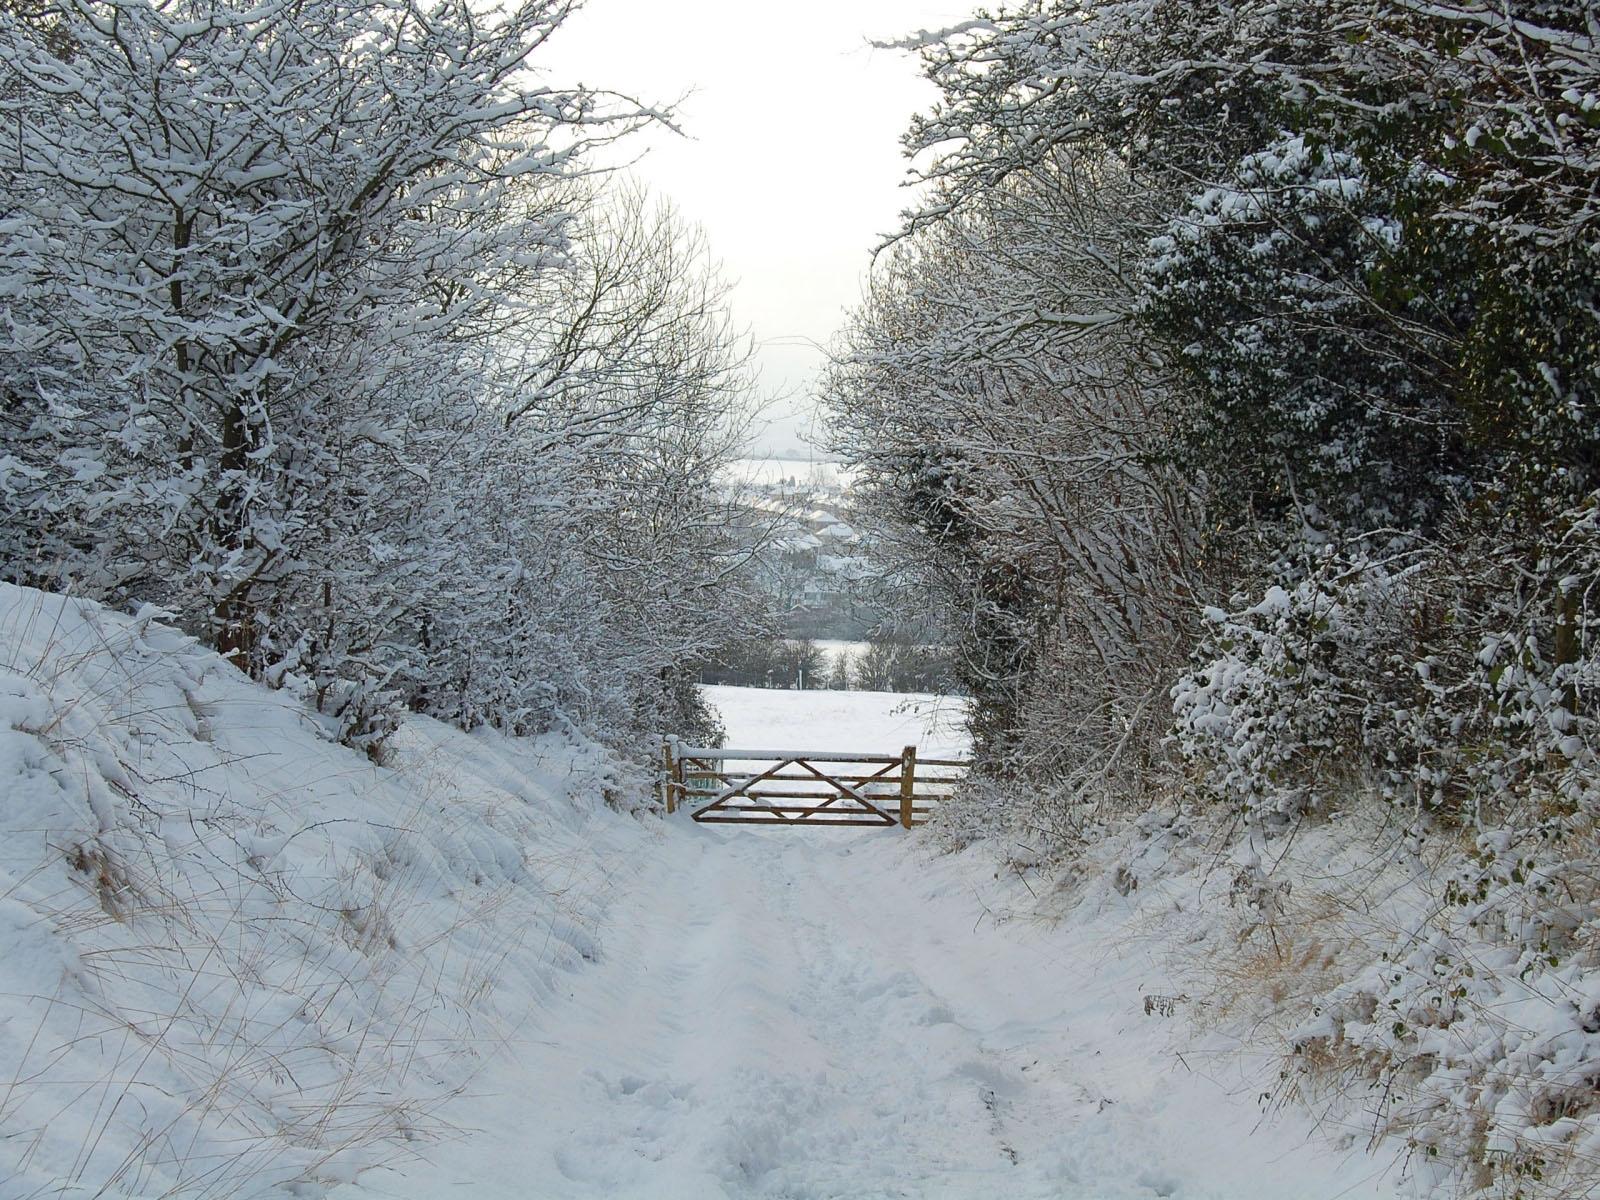 Winter Scenes Wallpaper Free Download | wallpaper, wallpaper hd ...